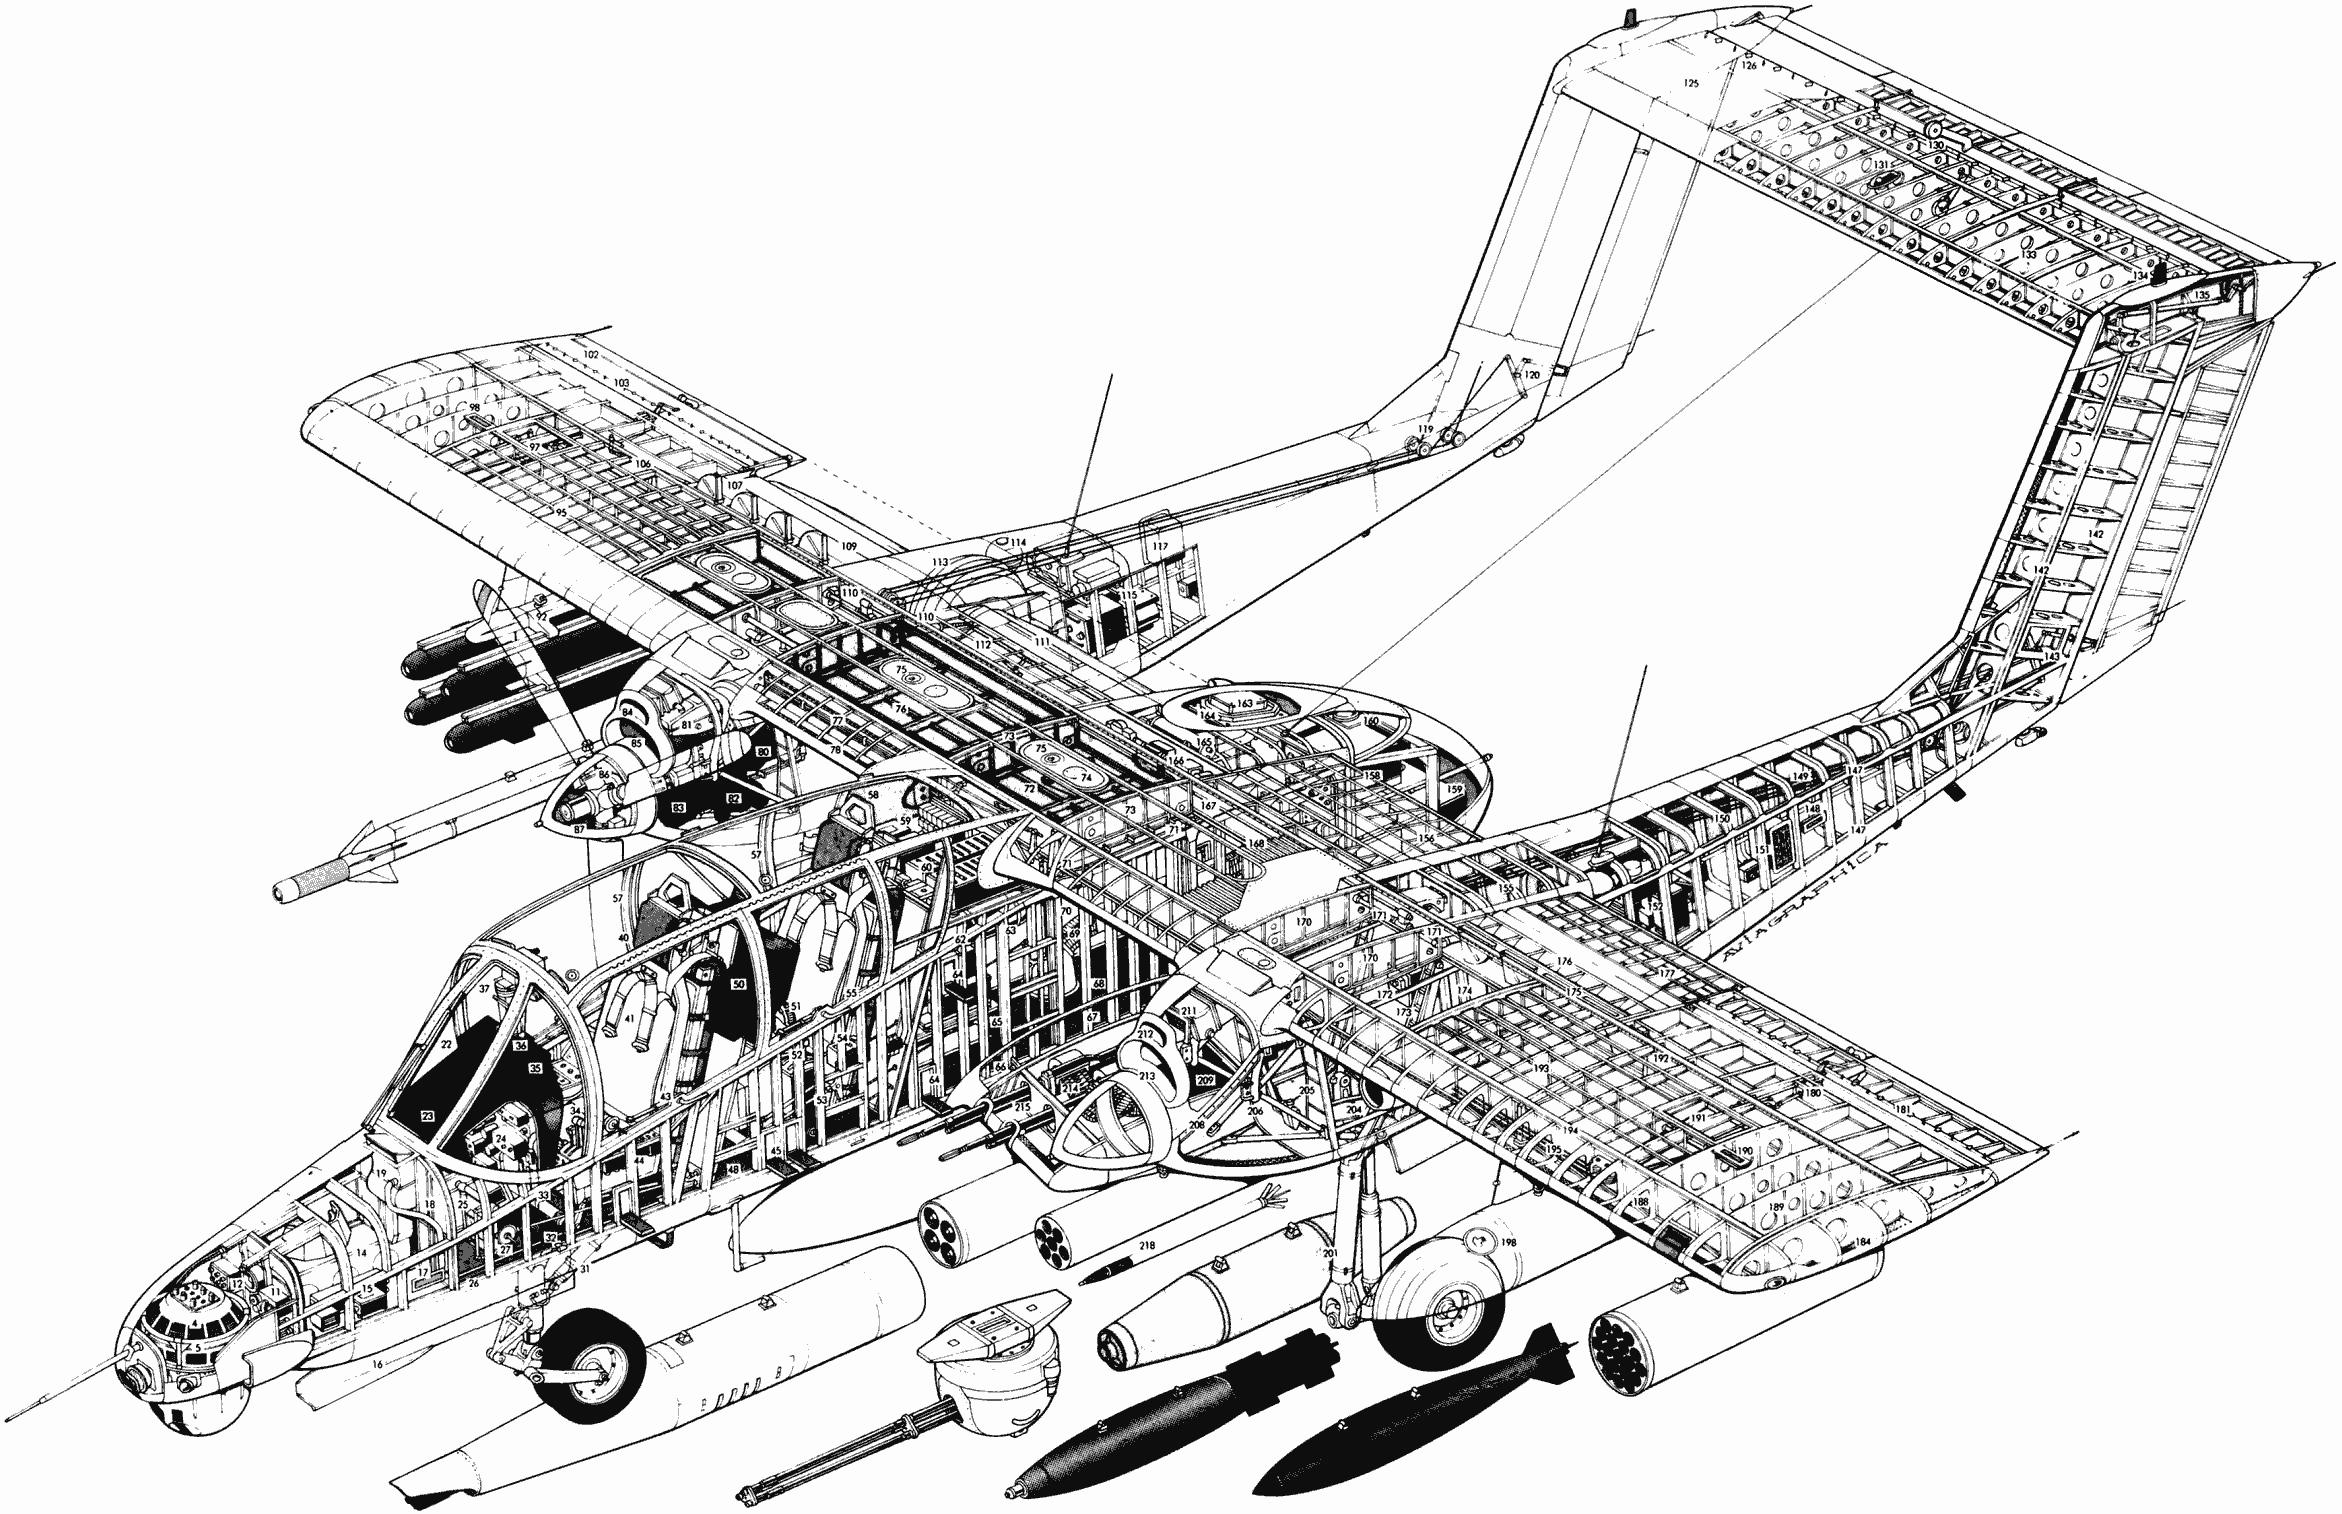 North American Rockwell OV-10 Bronco PDF eBook + Manuals